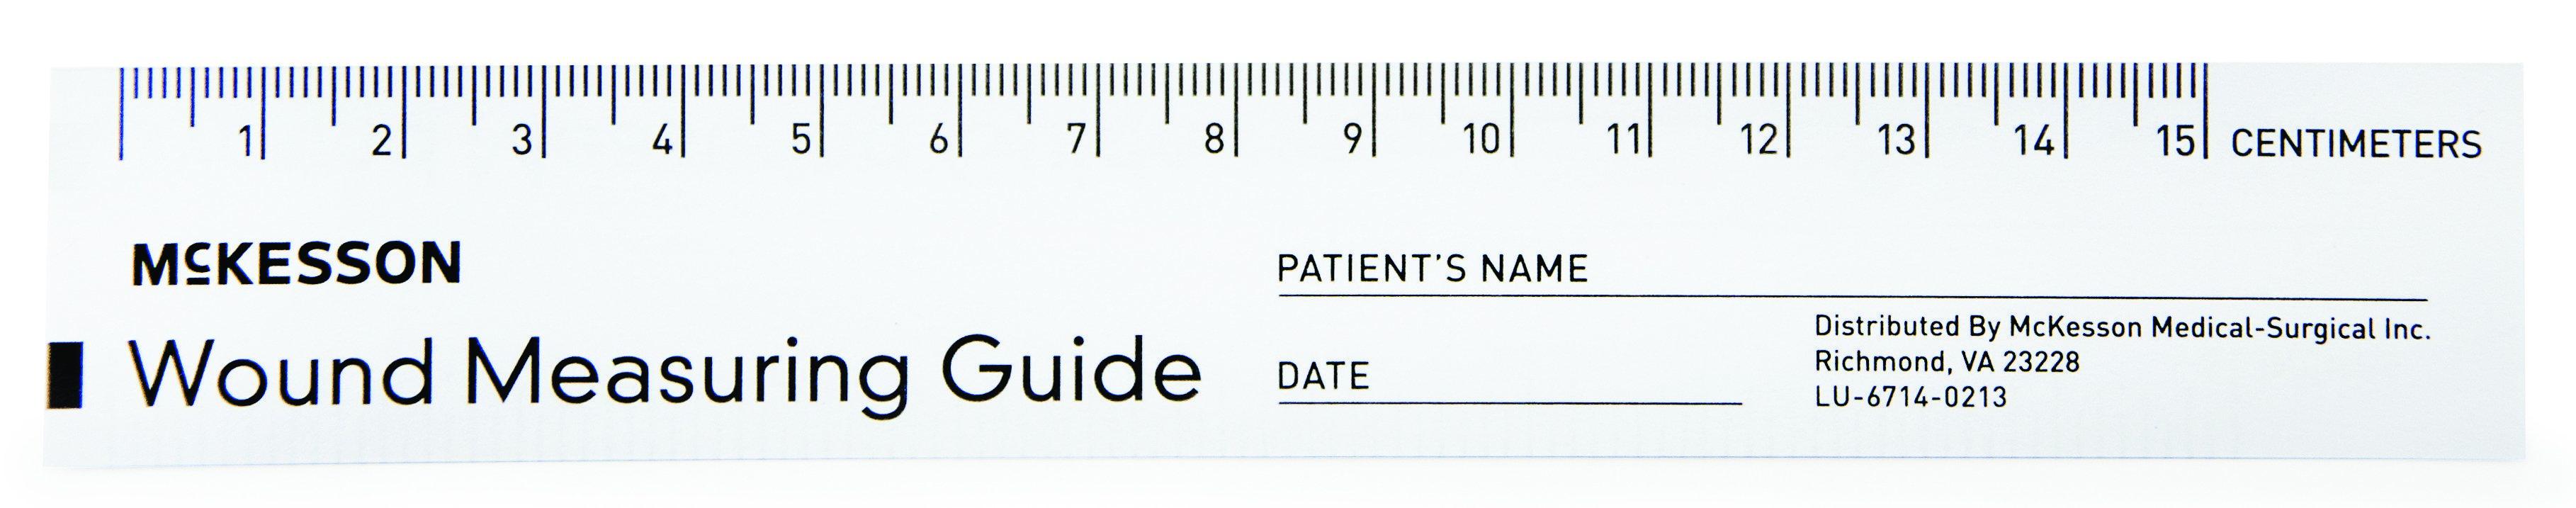 mckesson wound measuring guide paper avacare medical rh avacaremedical com mckesson star user manual mckesson star navigator manual